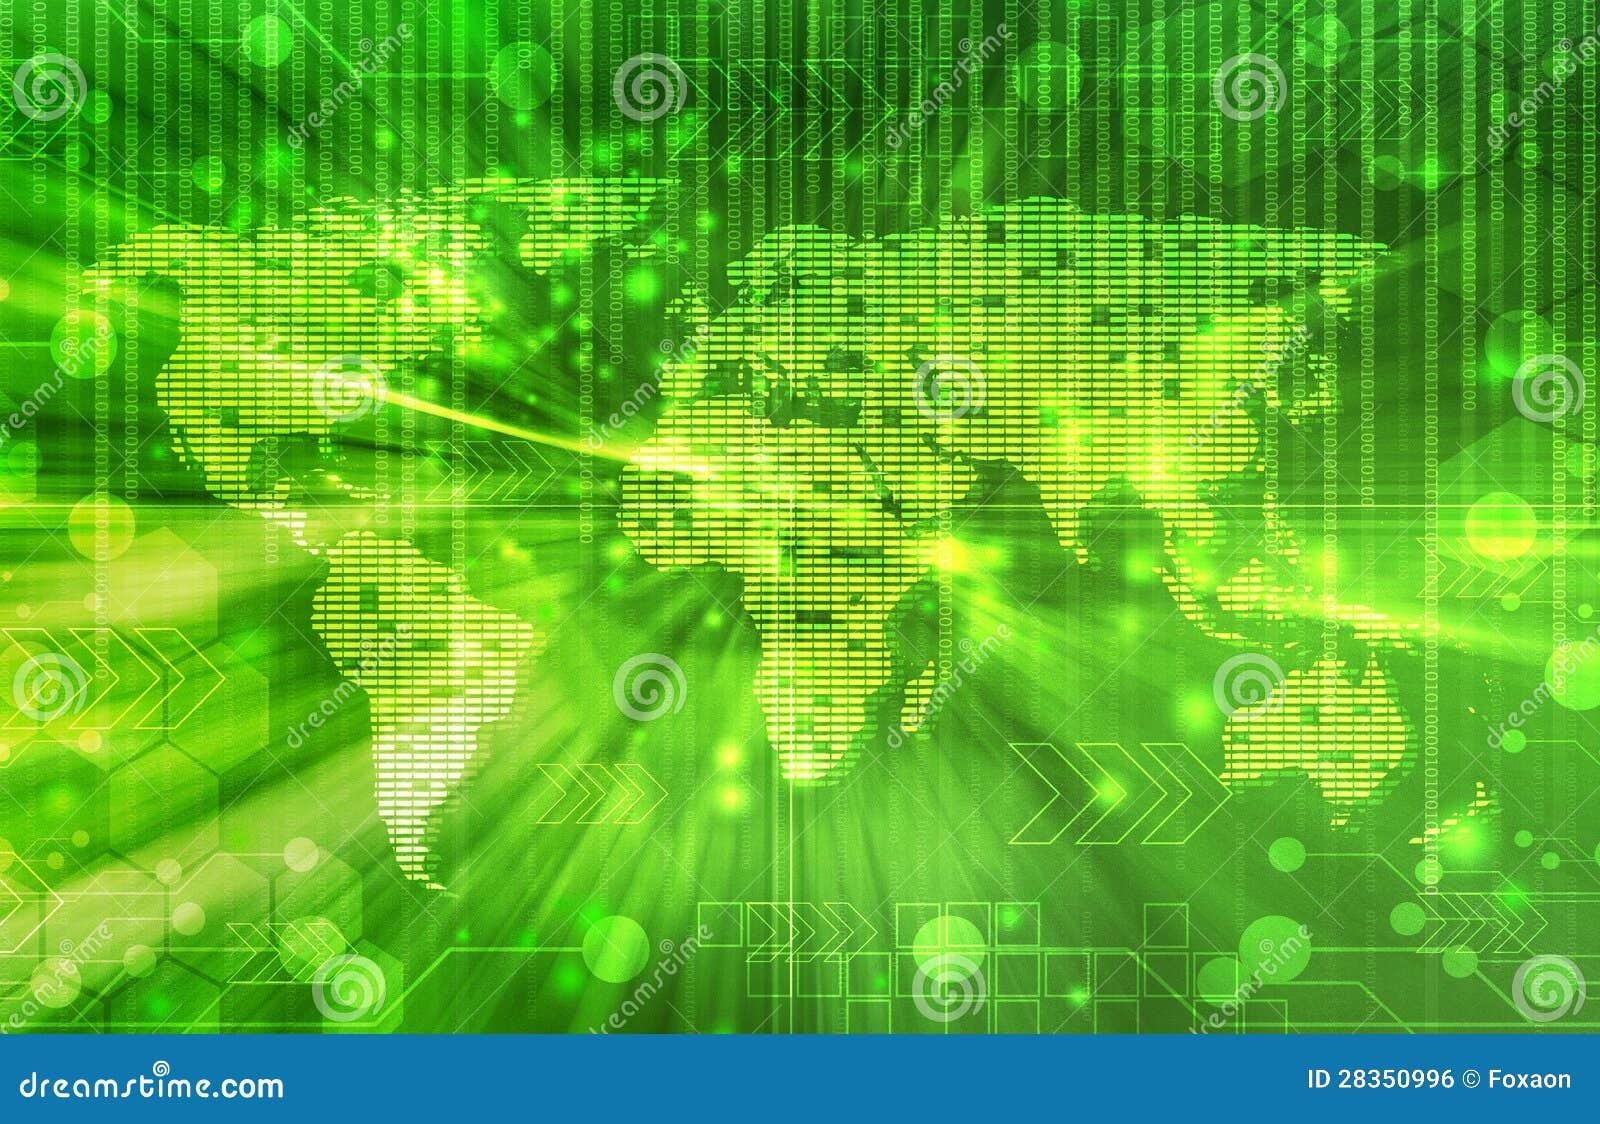 Green World Digital Background Royalty Free Stock Image